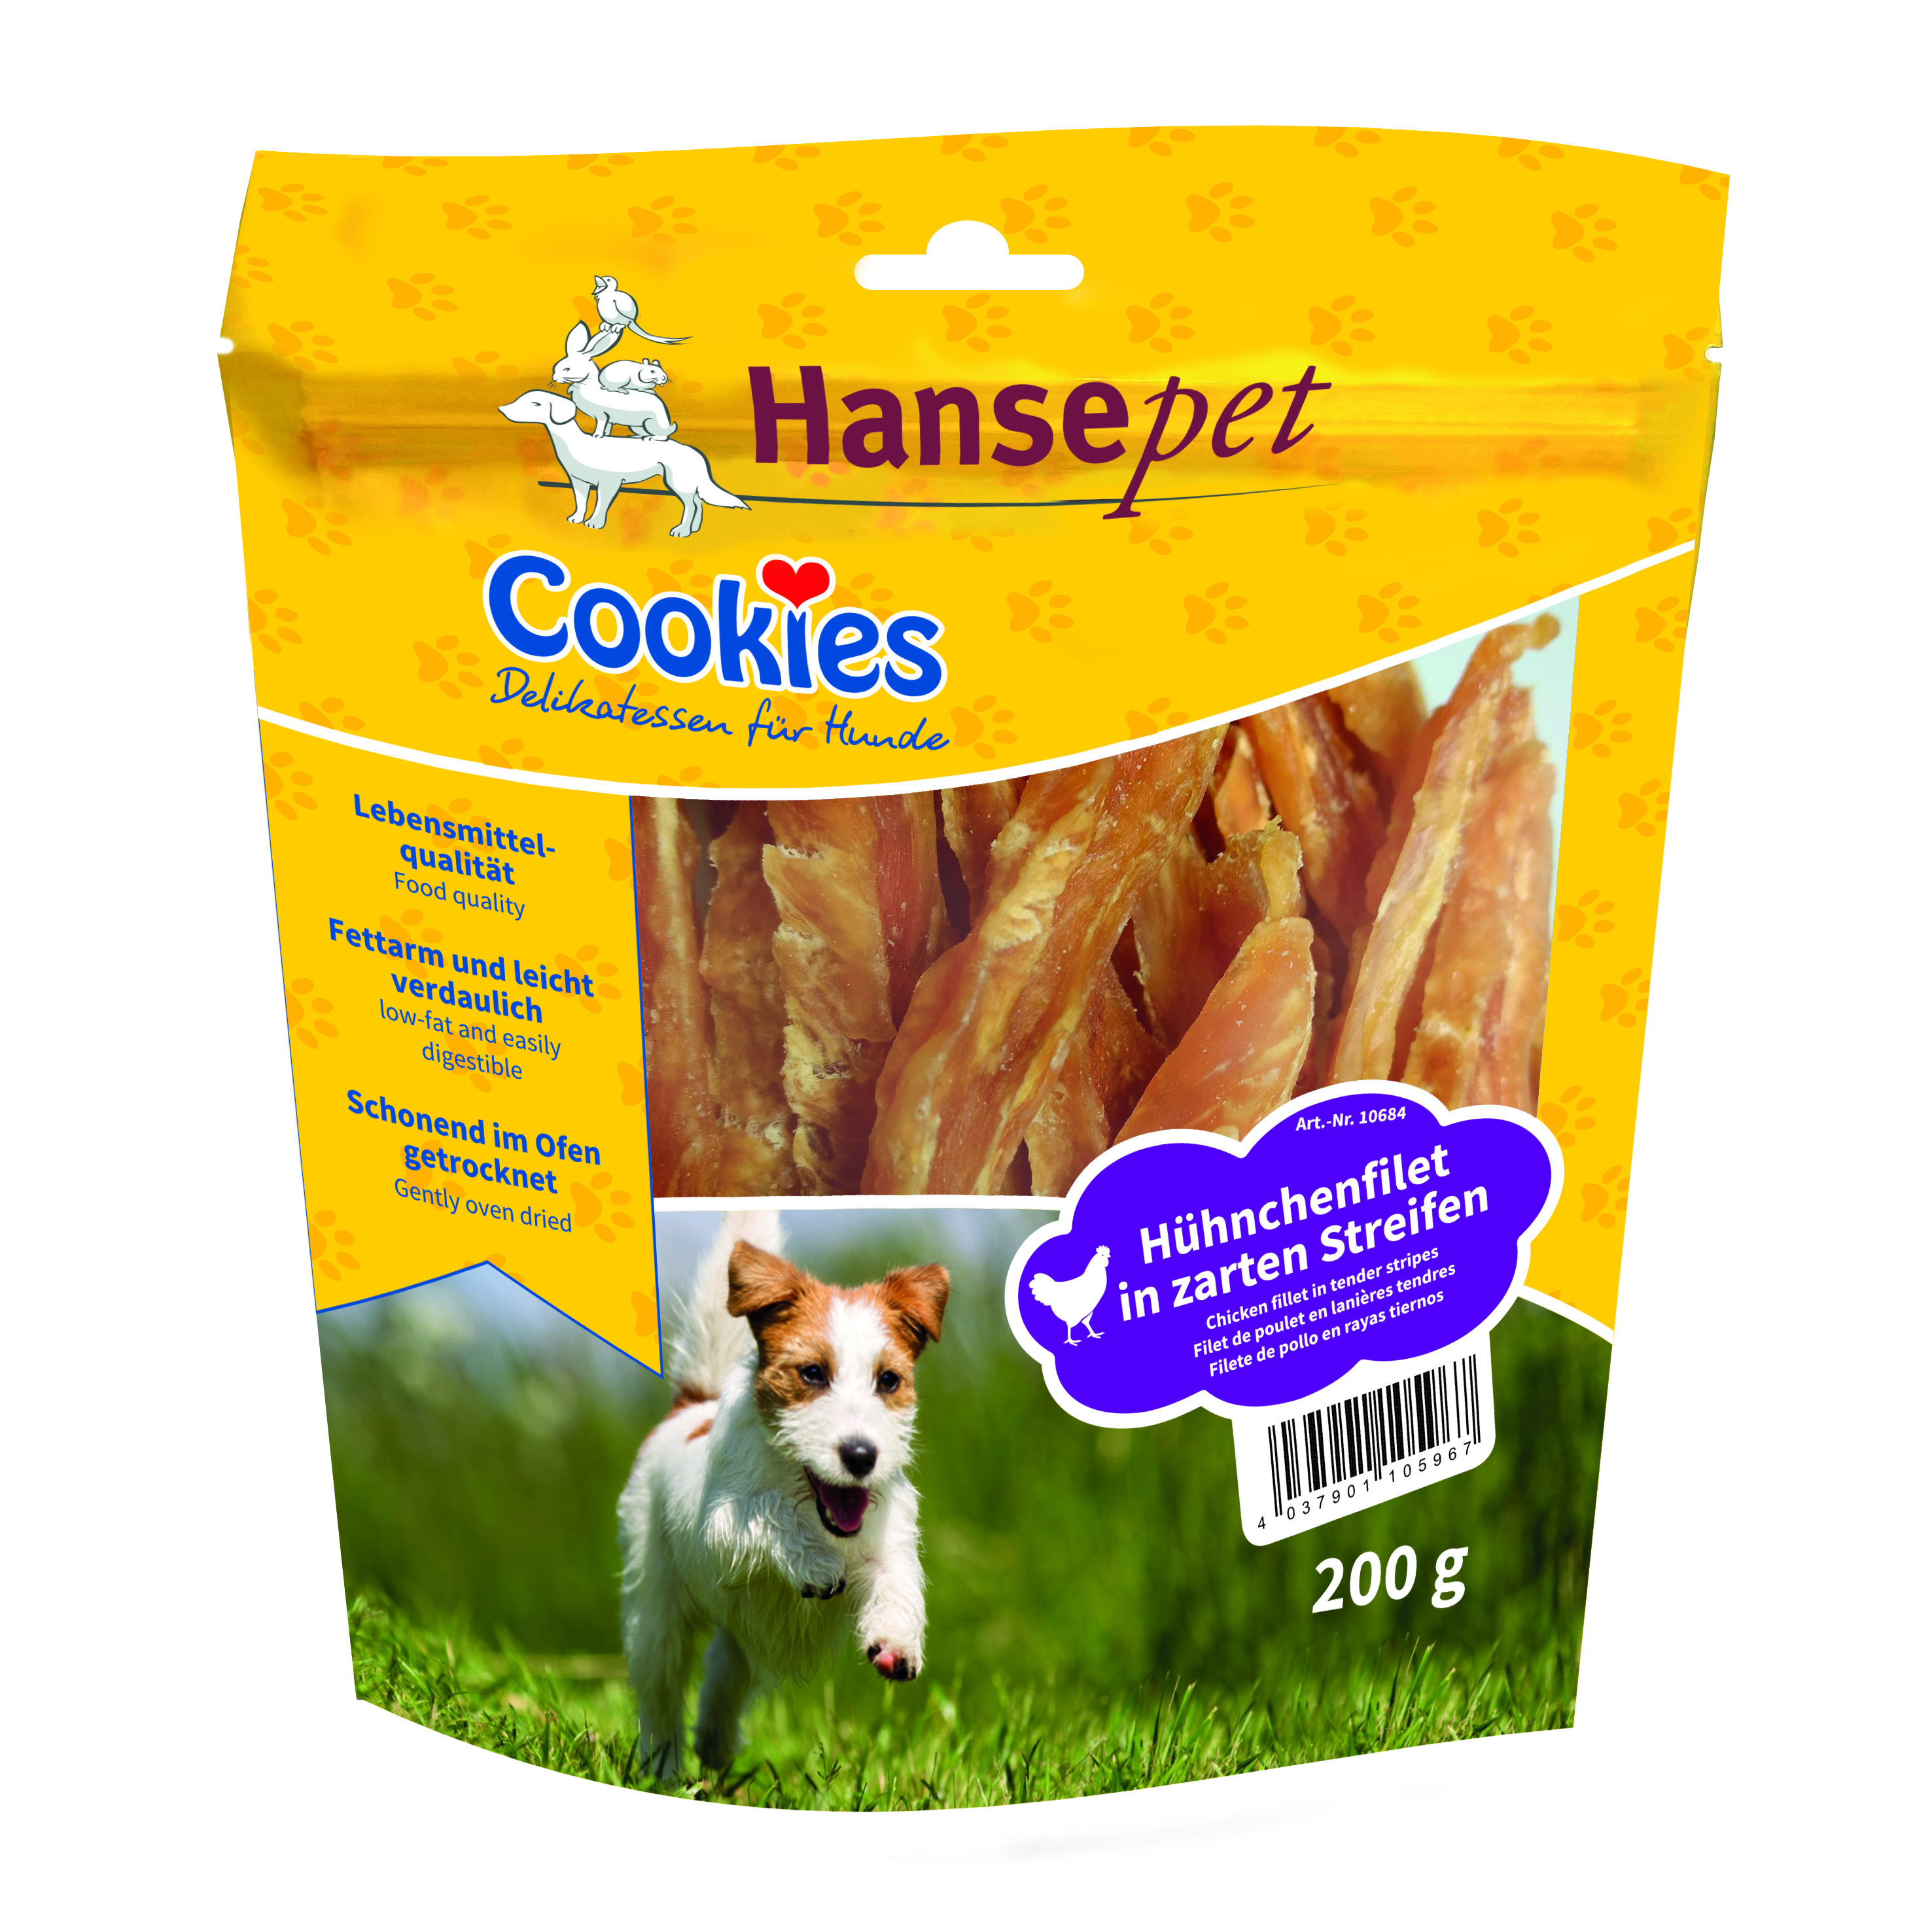 Hühnchenfiletstreifen, Cookies Hansepet